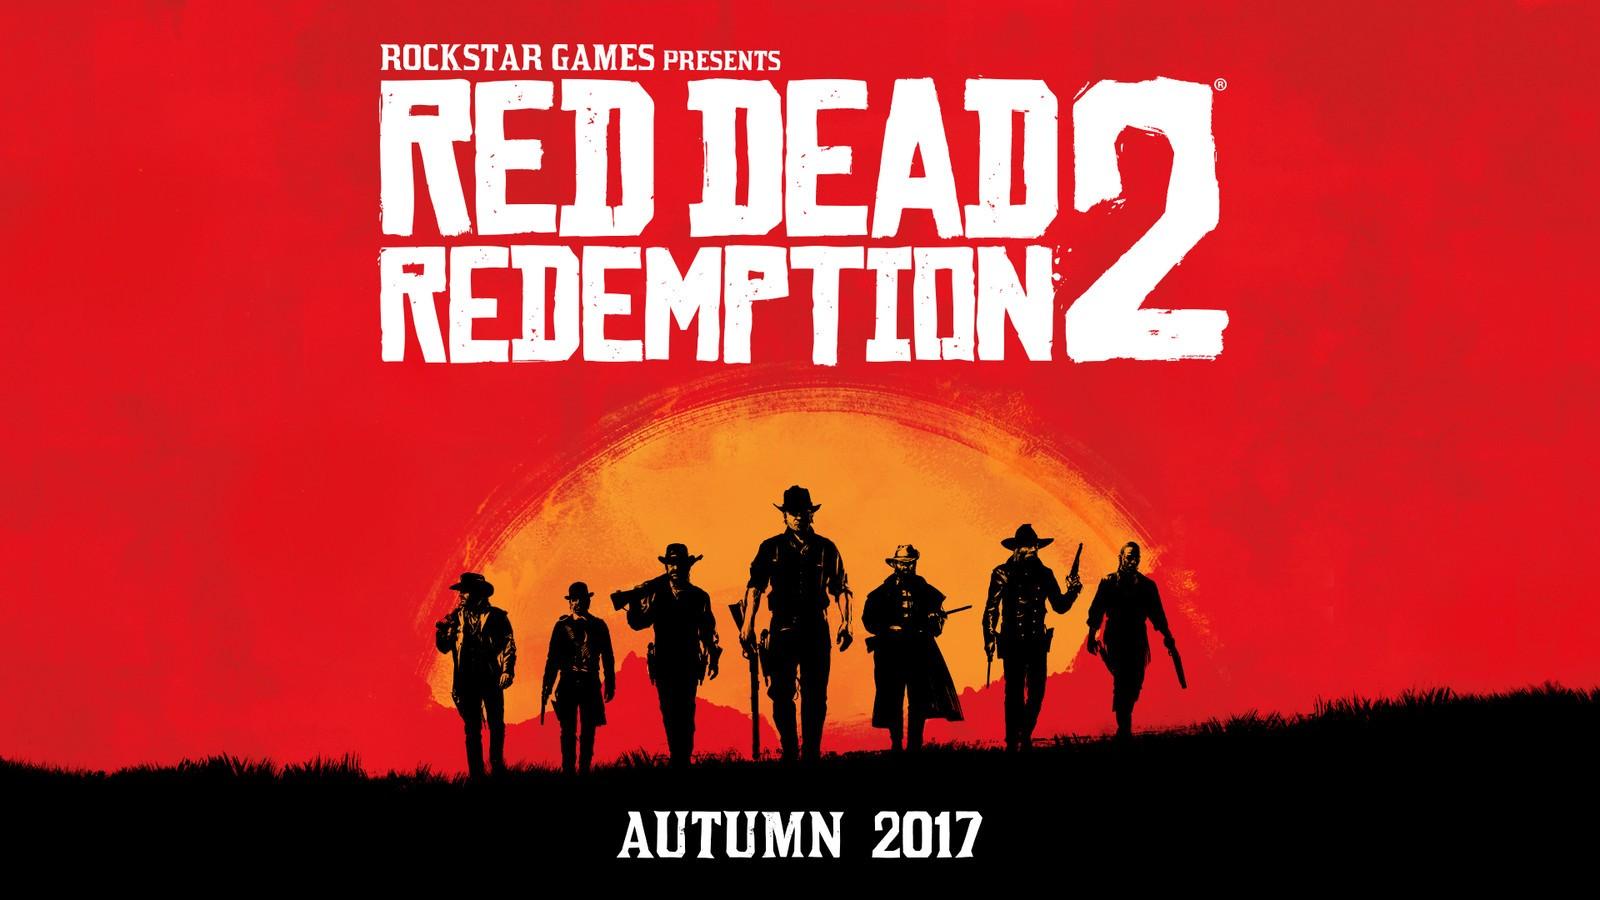 Microsoft использует игры Forza 7 Battlefront 2 и Red Dead Redemption 2 для показа приставки Xbox Scorpio в формате 4K